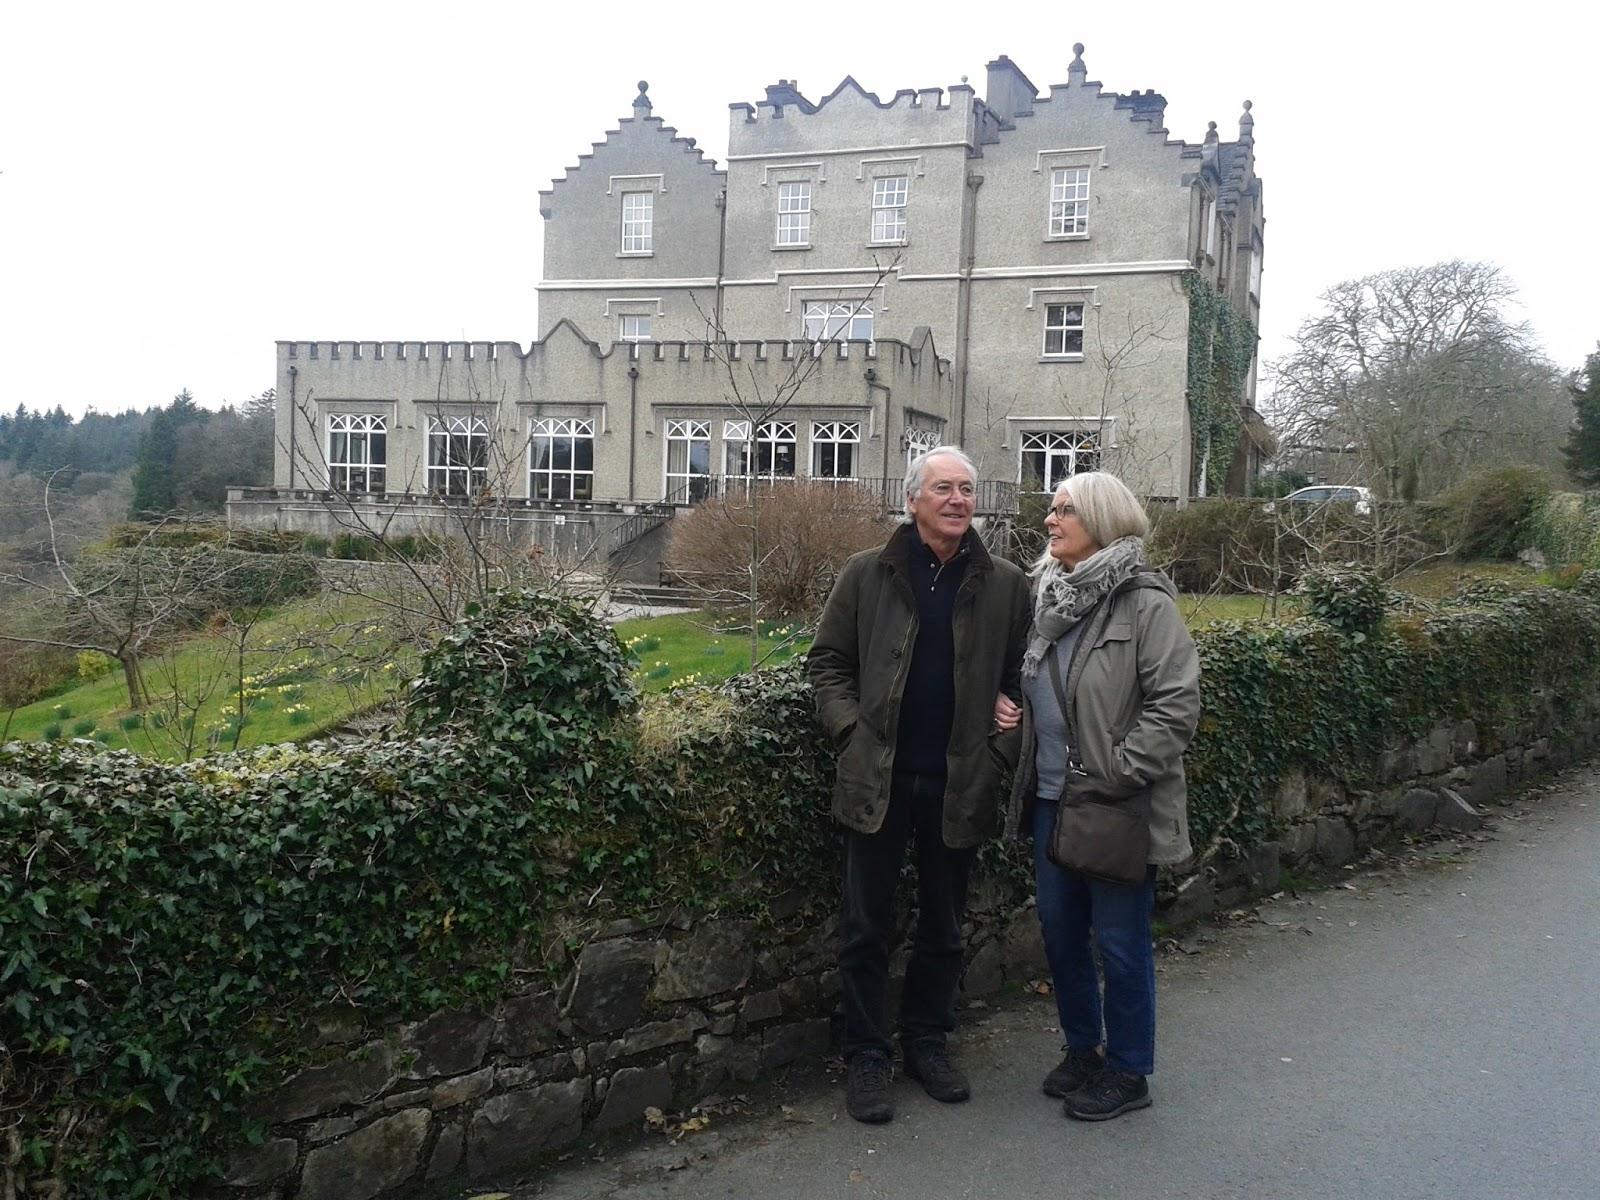 heart days in ireland: Ireland Diary March 2016 II